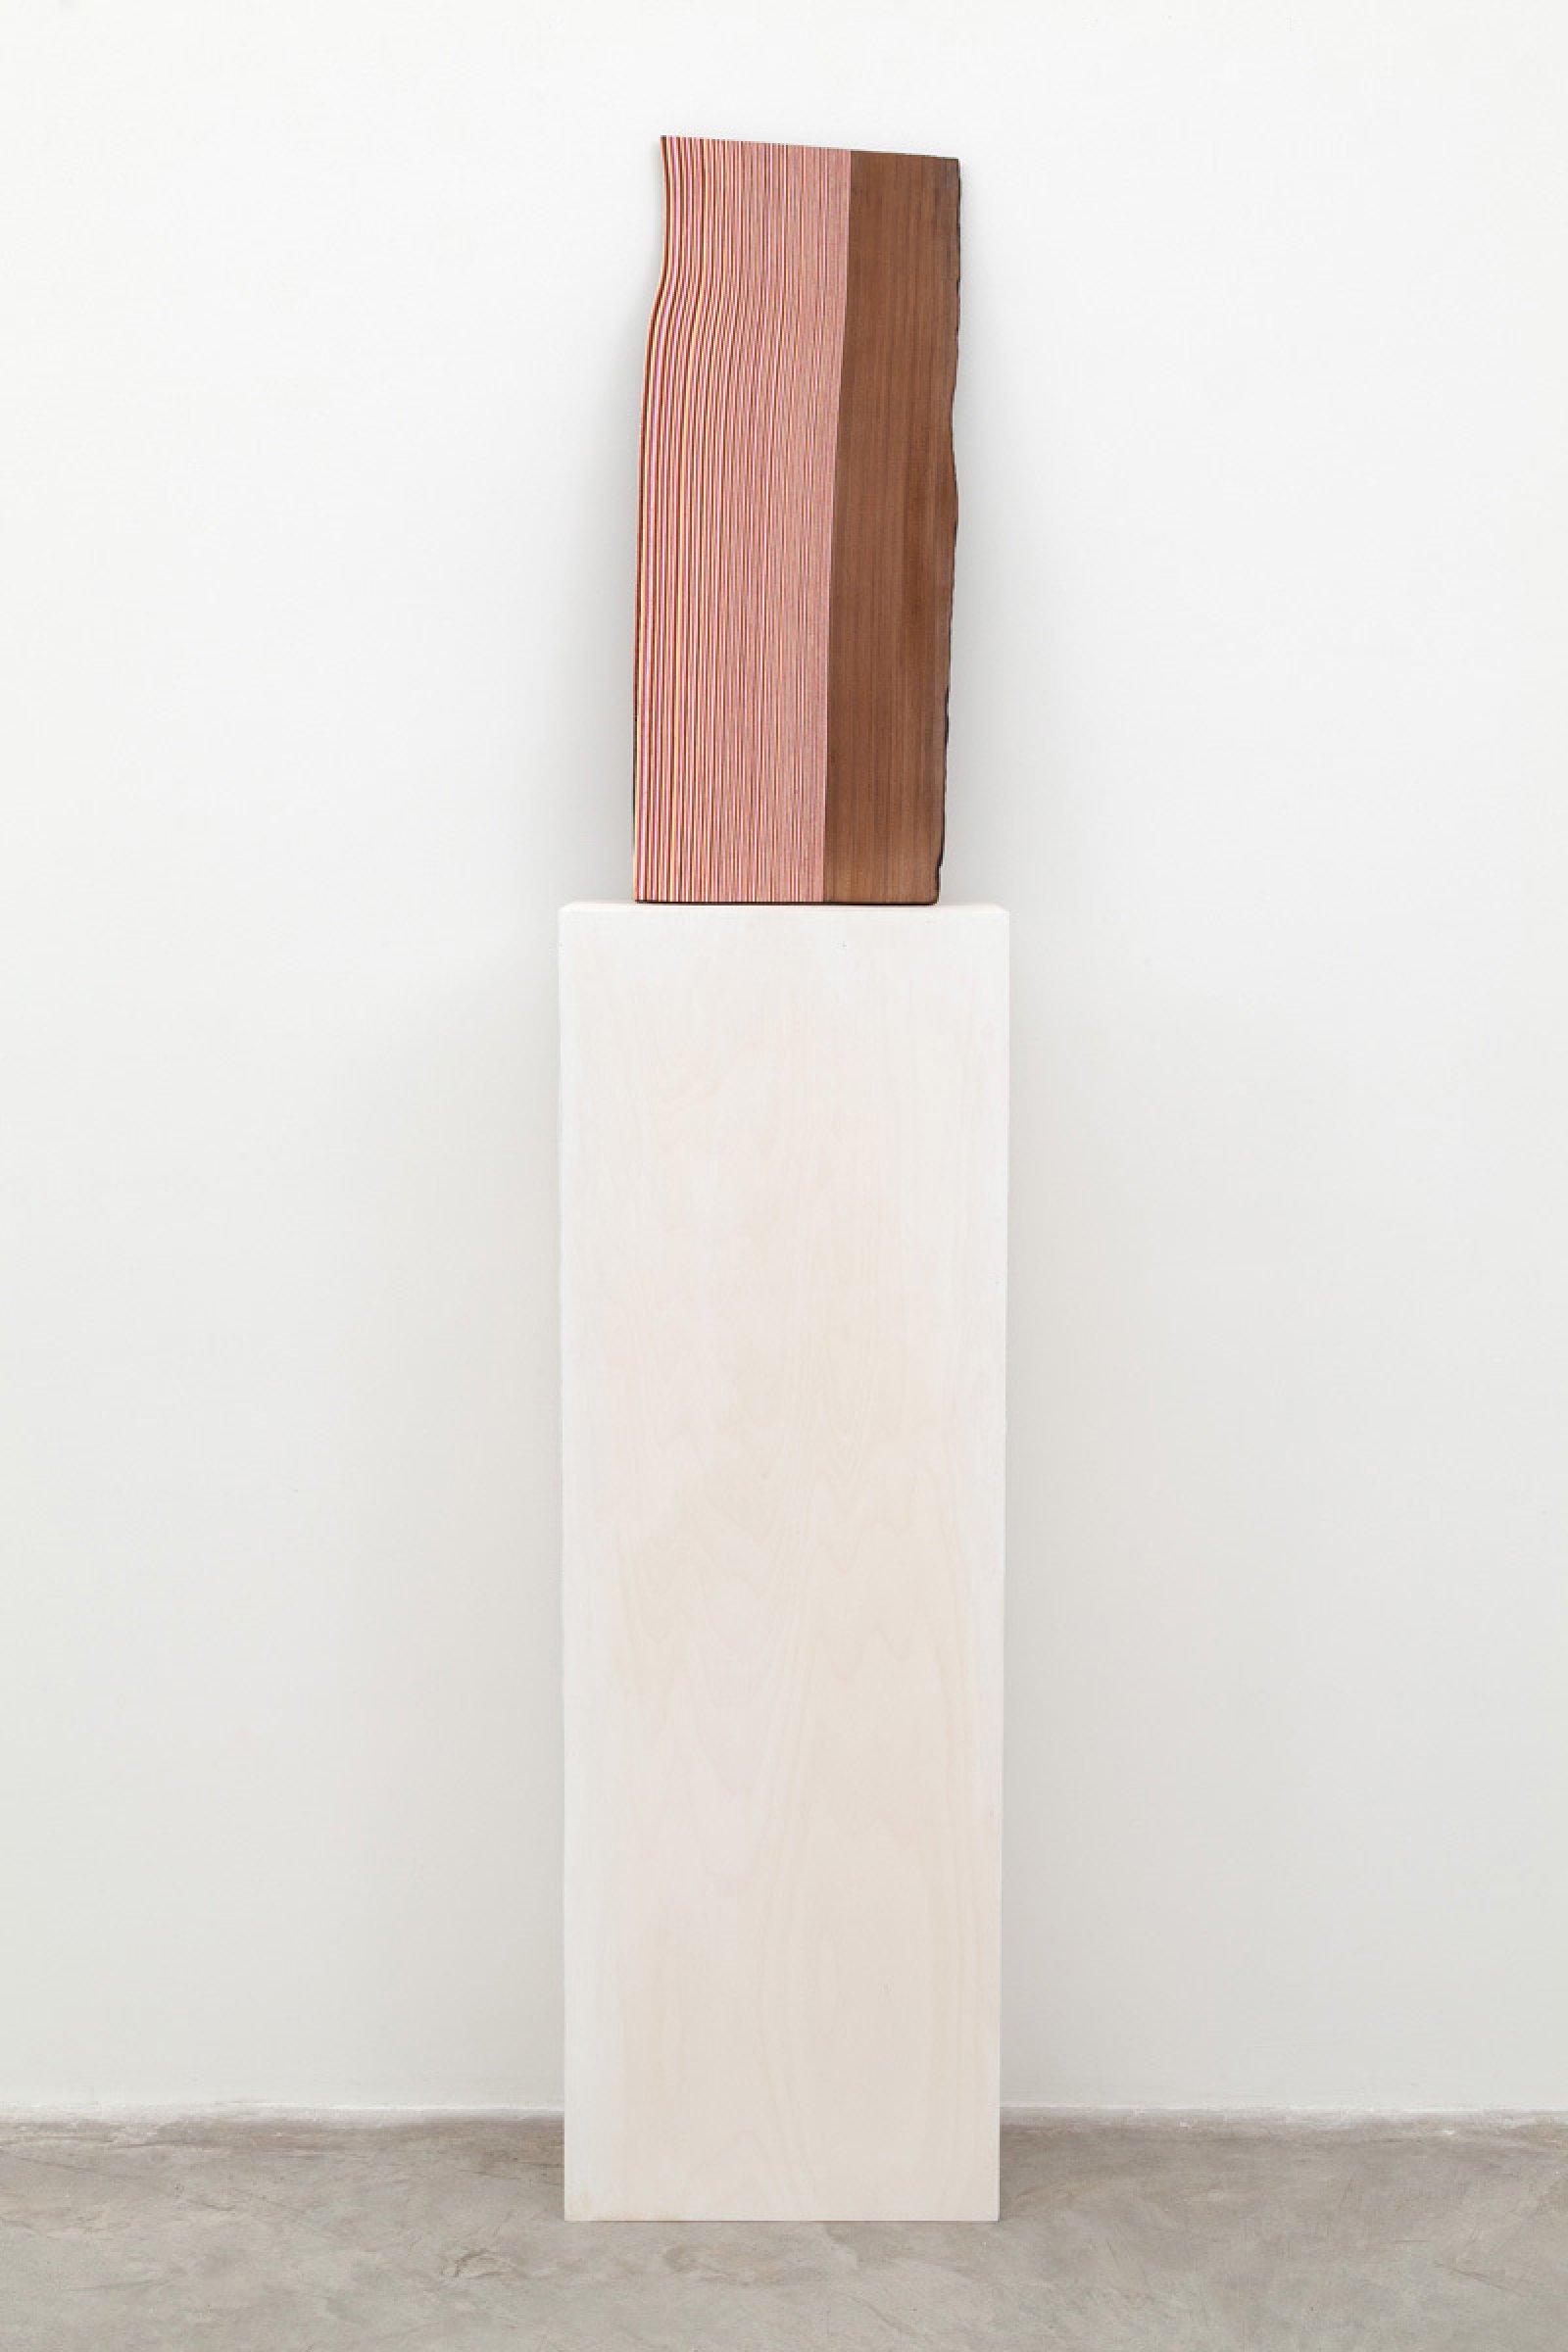 Brian Jungen,Shake, 2014, cedar, alkyd-resin enamel, 28 x 12 x 1 in. (70 x 29 x 2 cm)